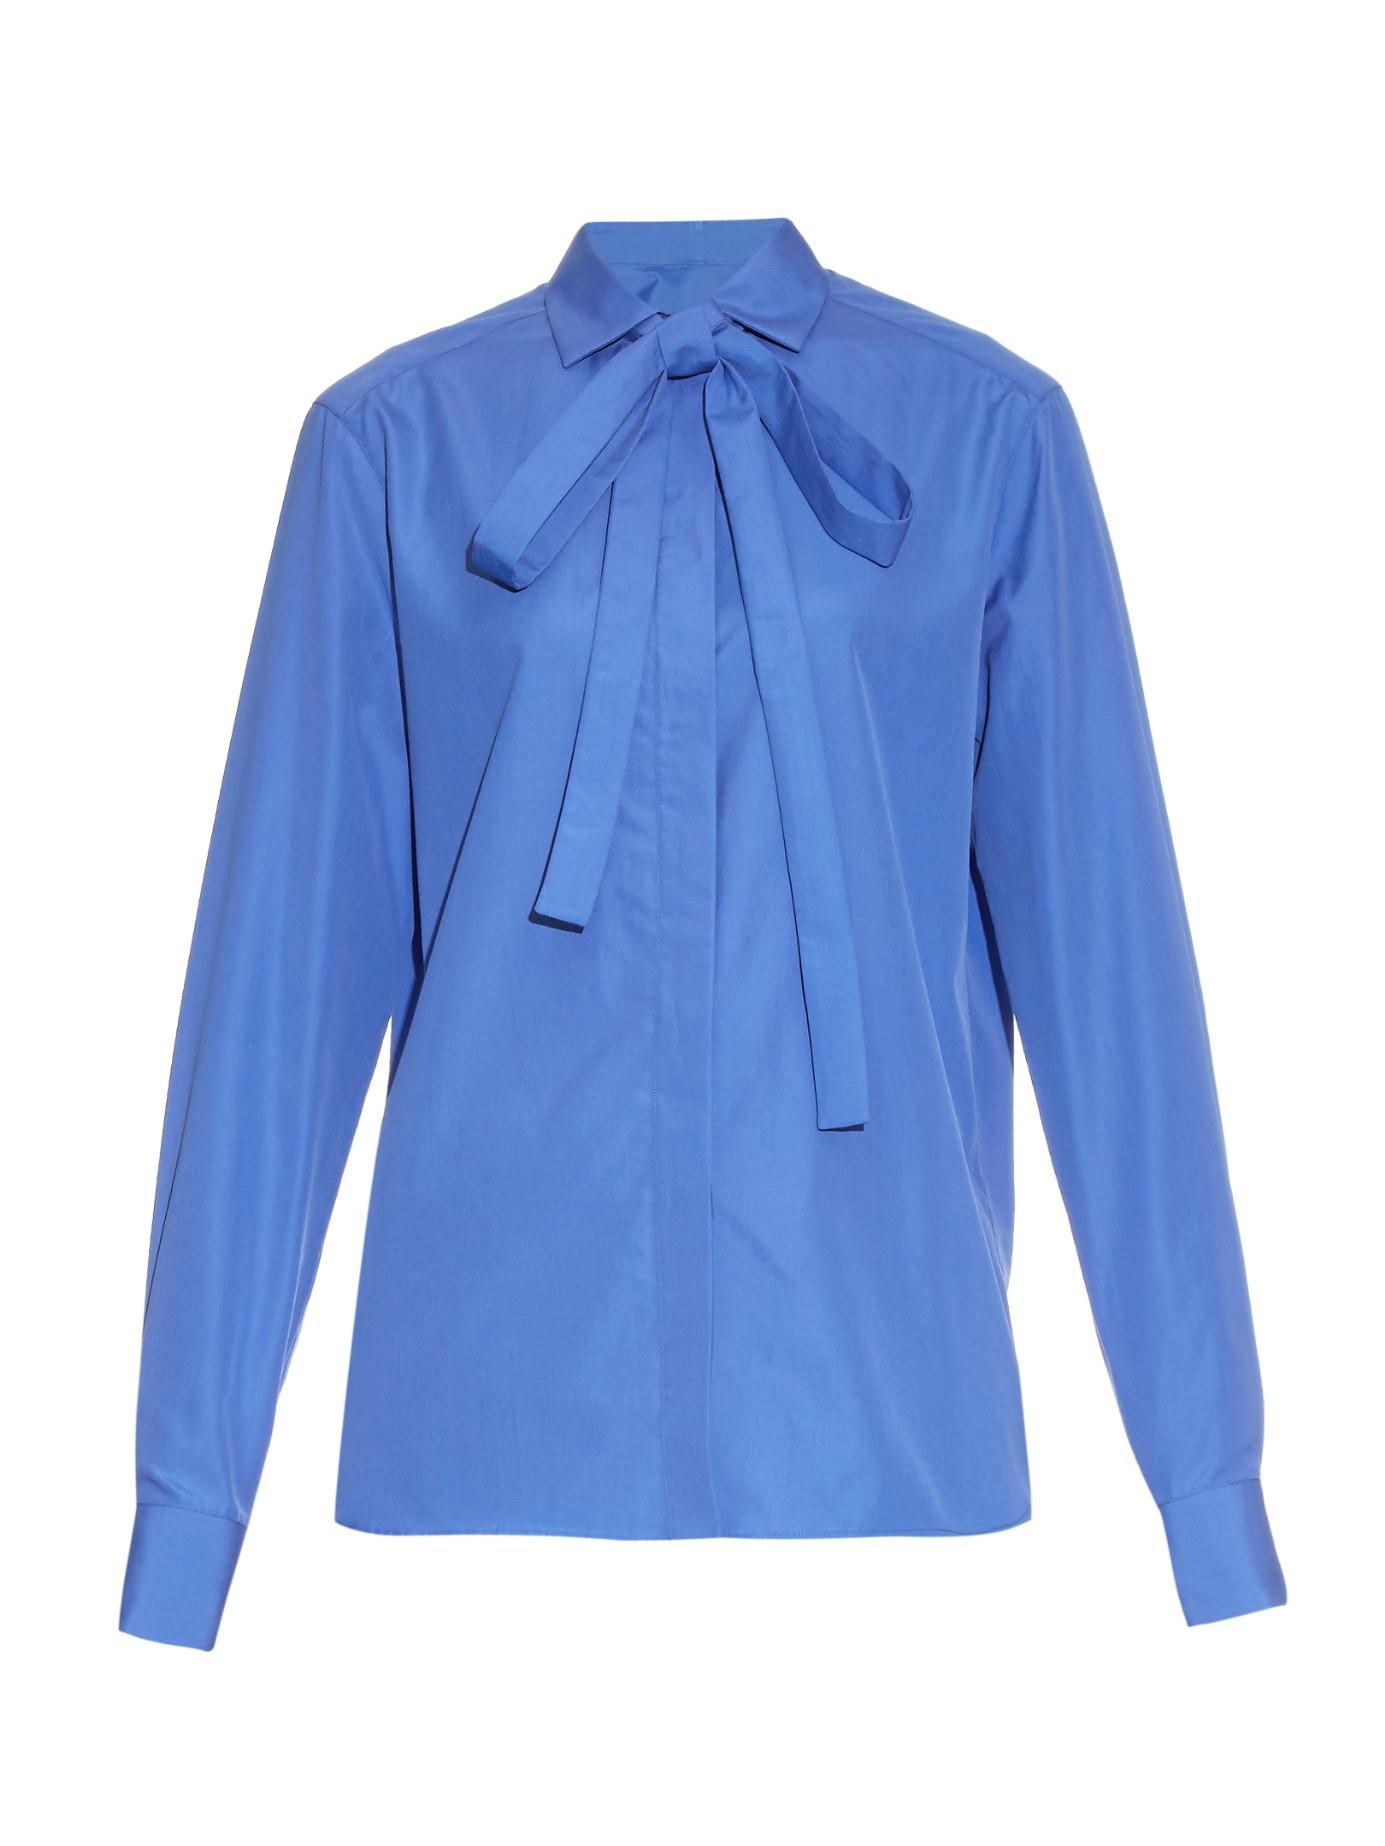 Lyst valentino long sleeved cotton poplin shirt in blue for Long sleeve poplin shirt